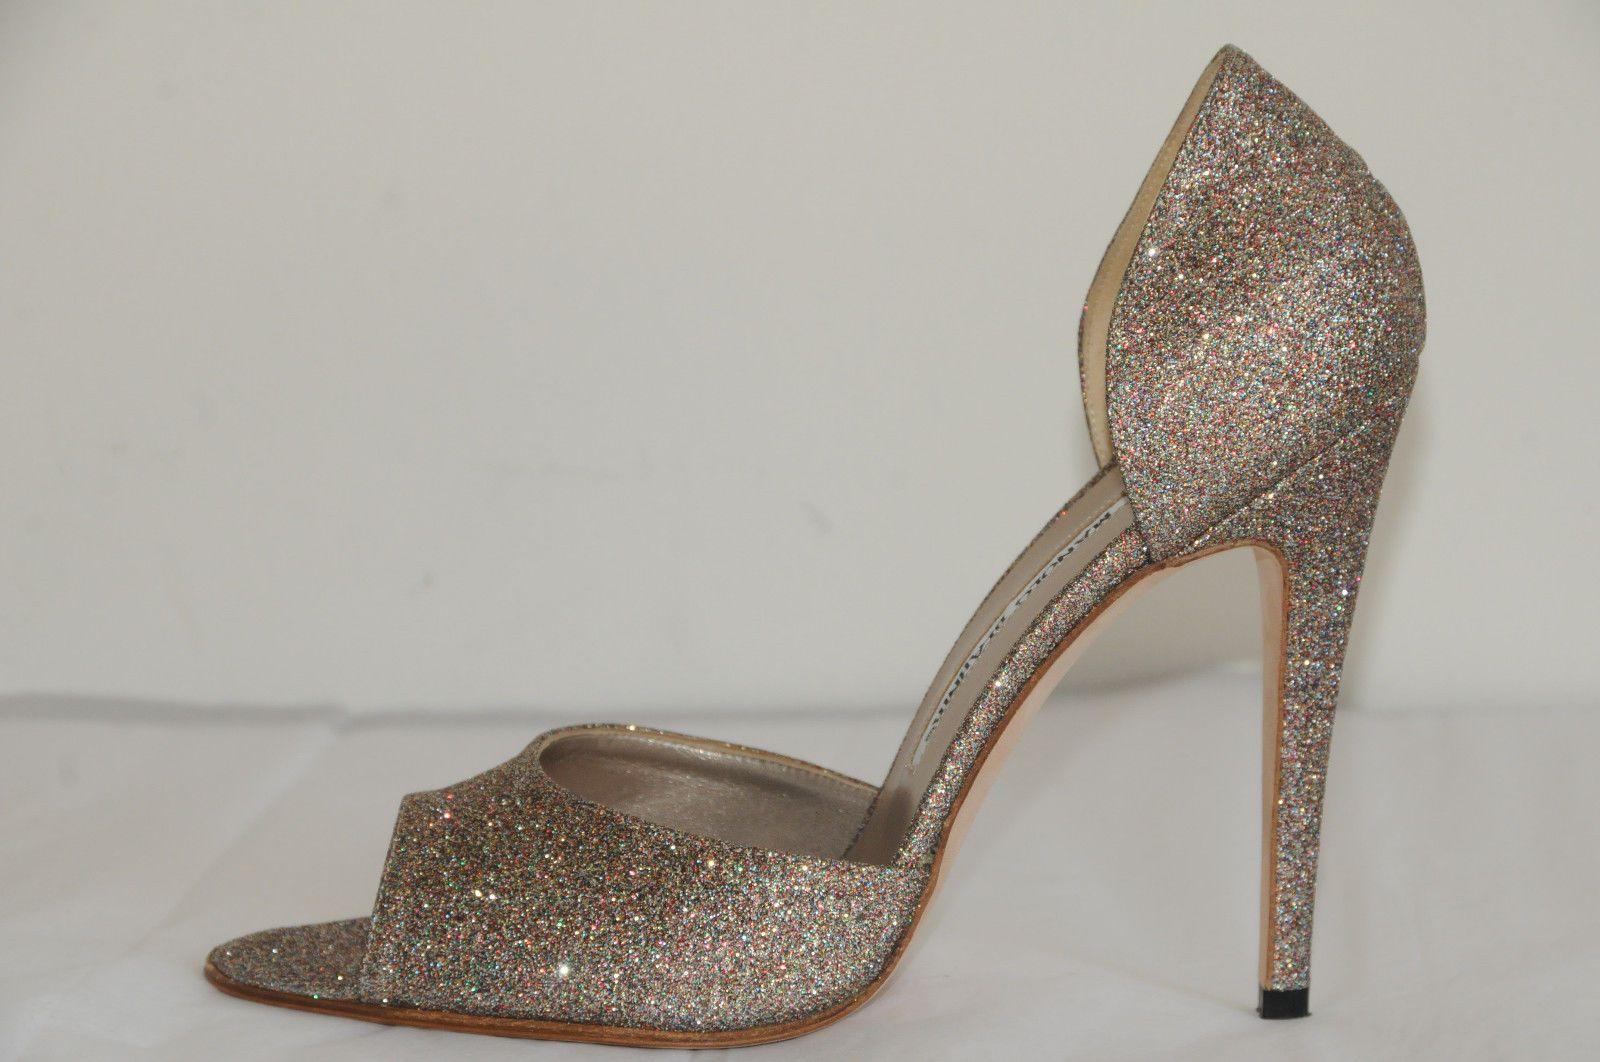 New Manolo Blahnik Astutado Mini Glitter Open Toe Dorsay Shoes